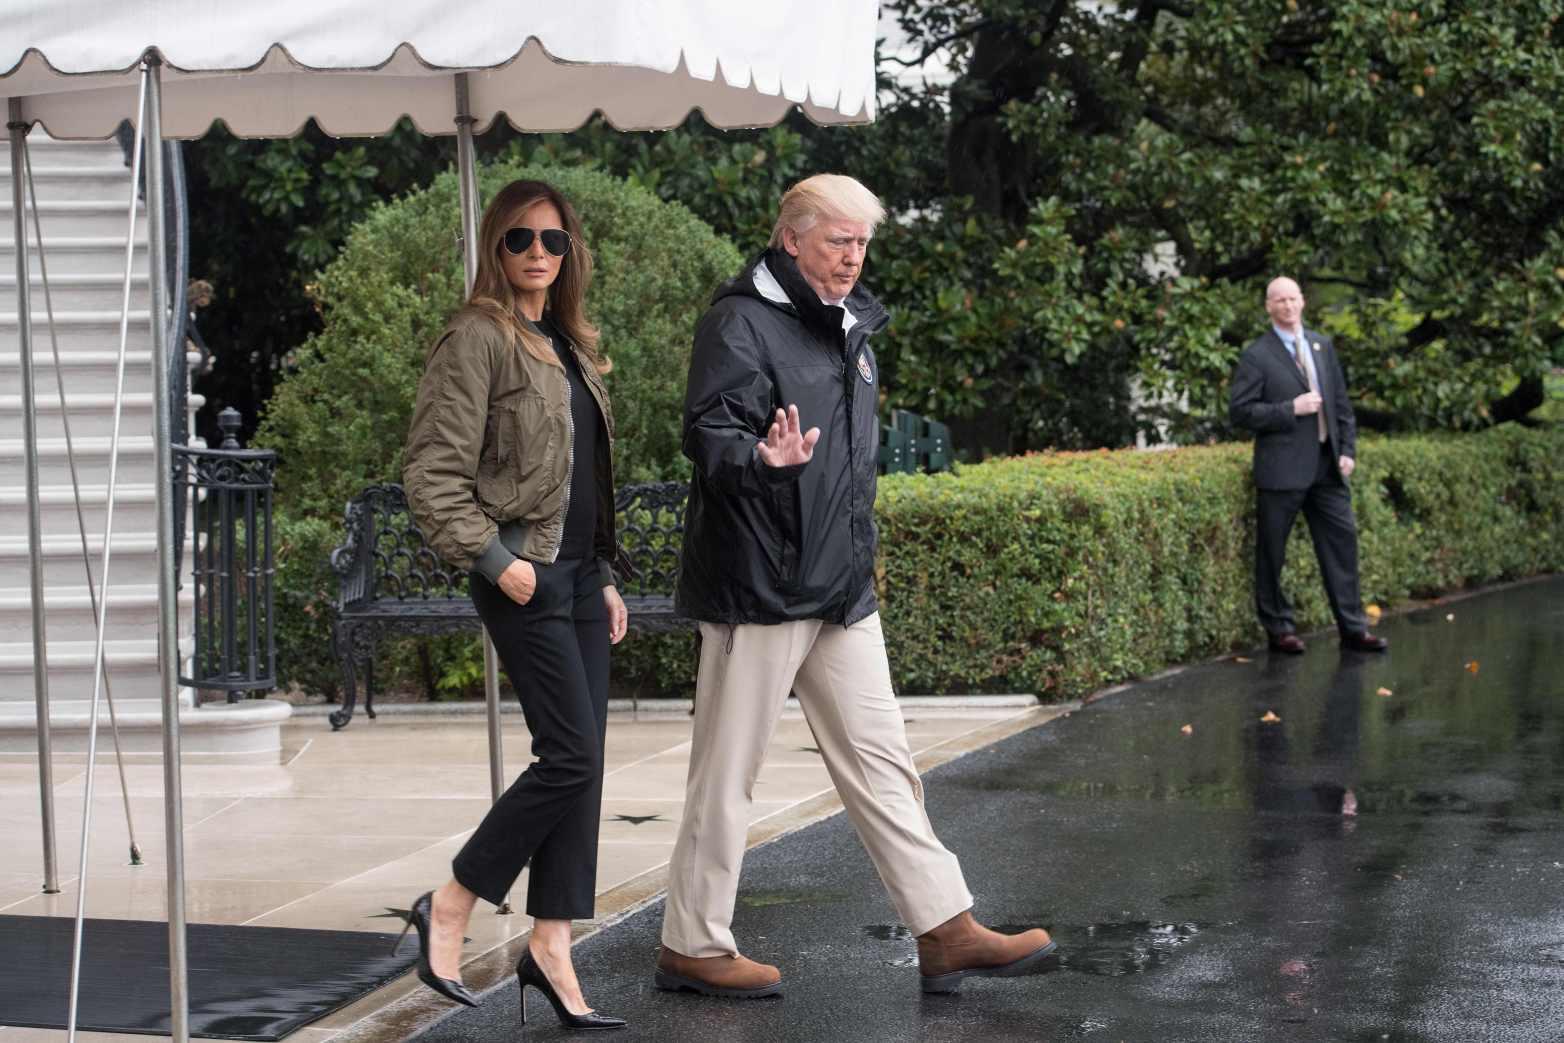 Melania Trump's Texas Heels Erupt on Twitter